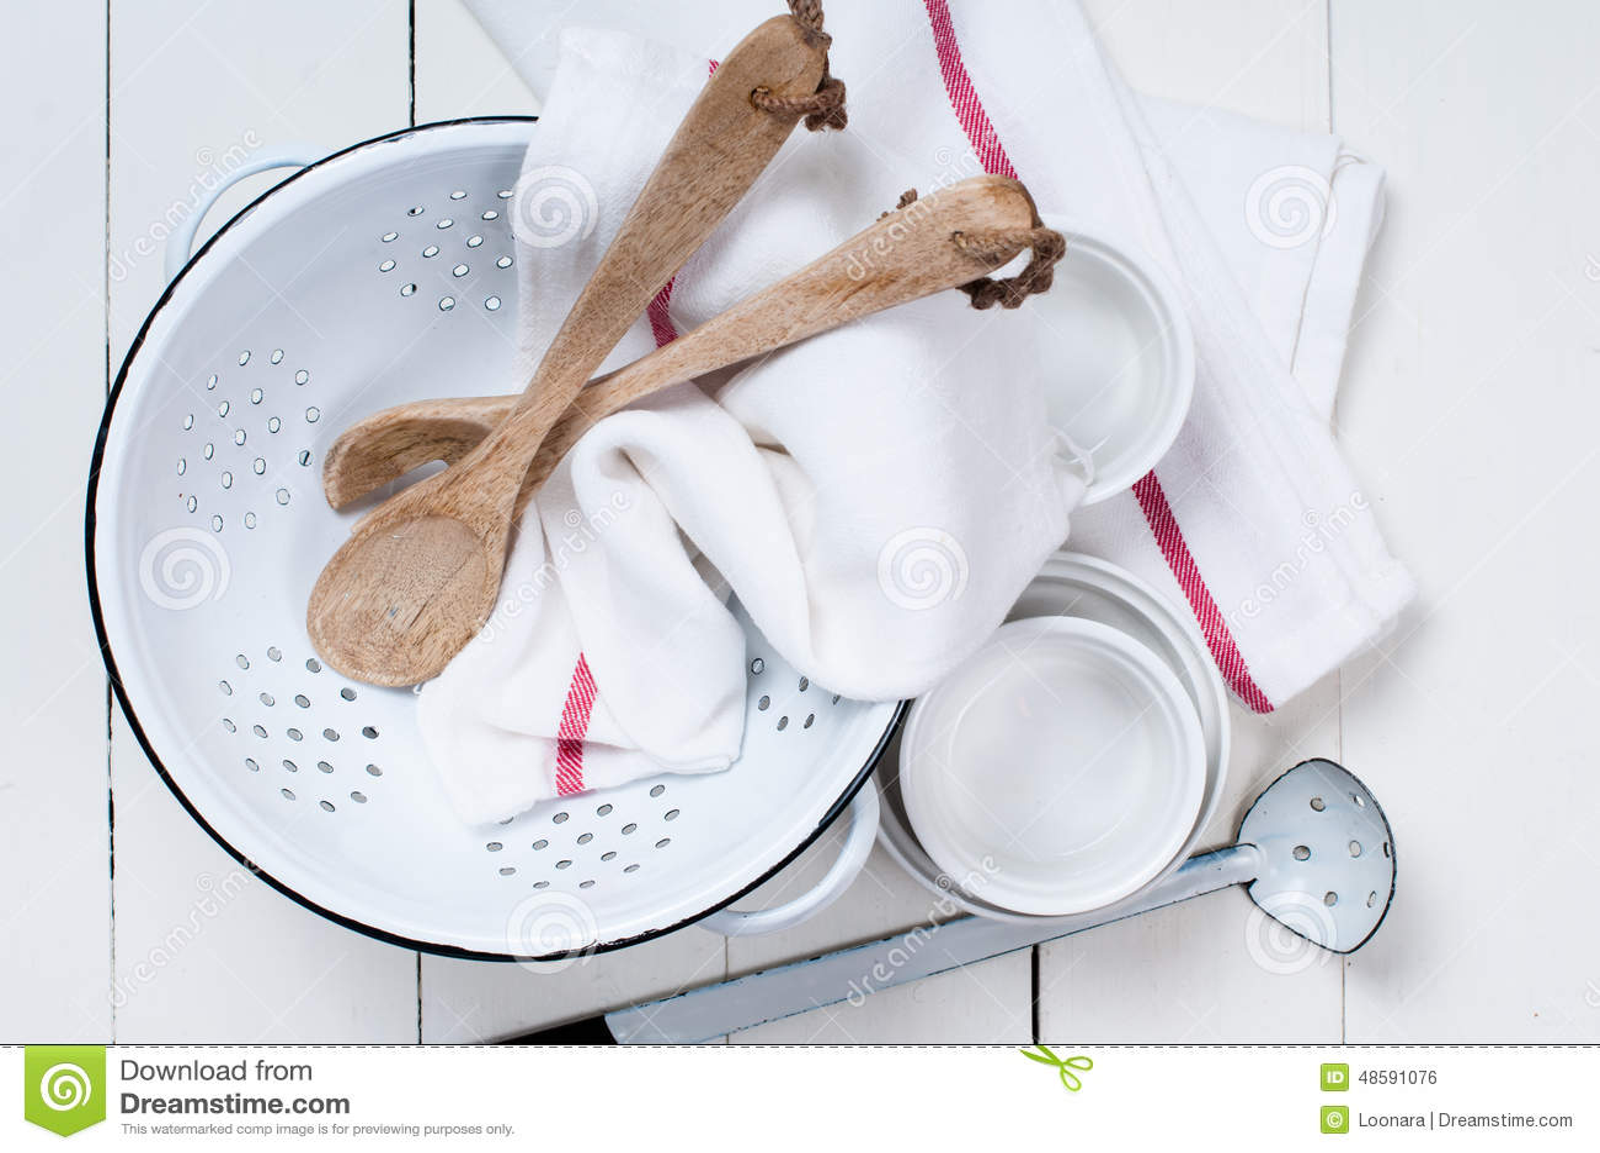 Wooden Spoons Kitchen Web Design